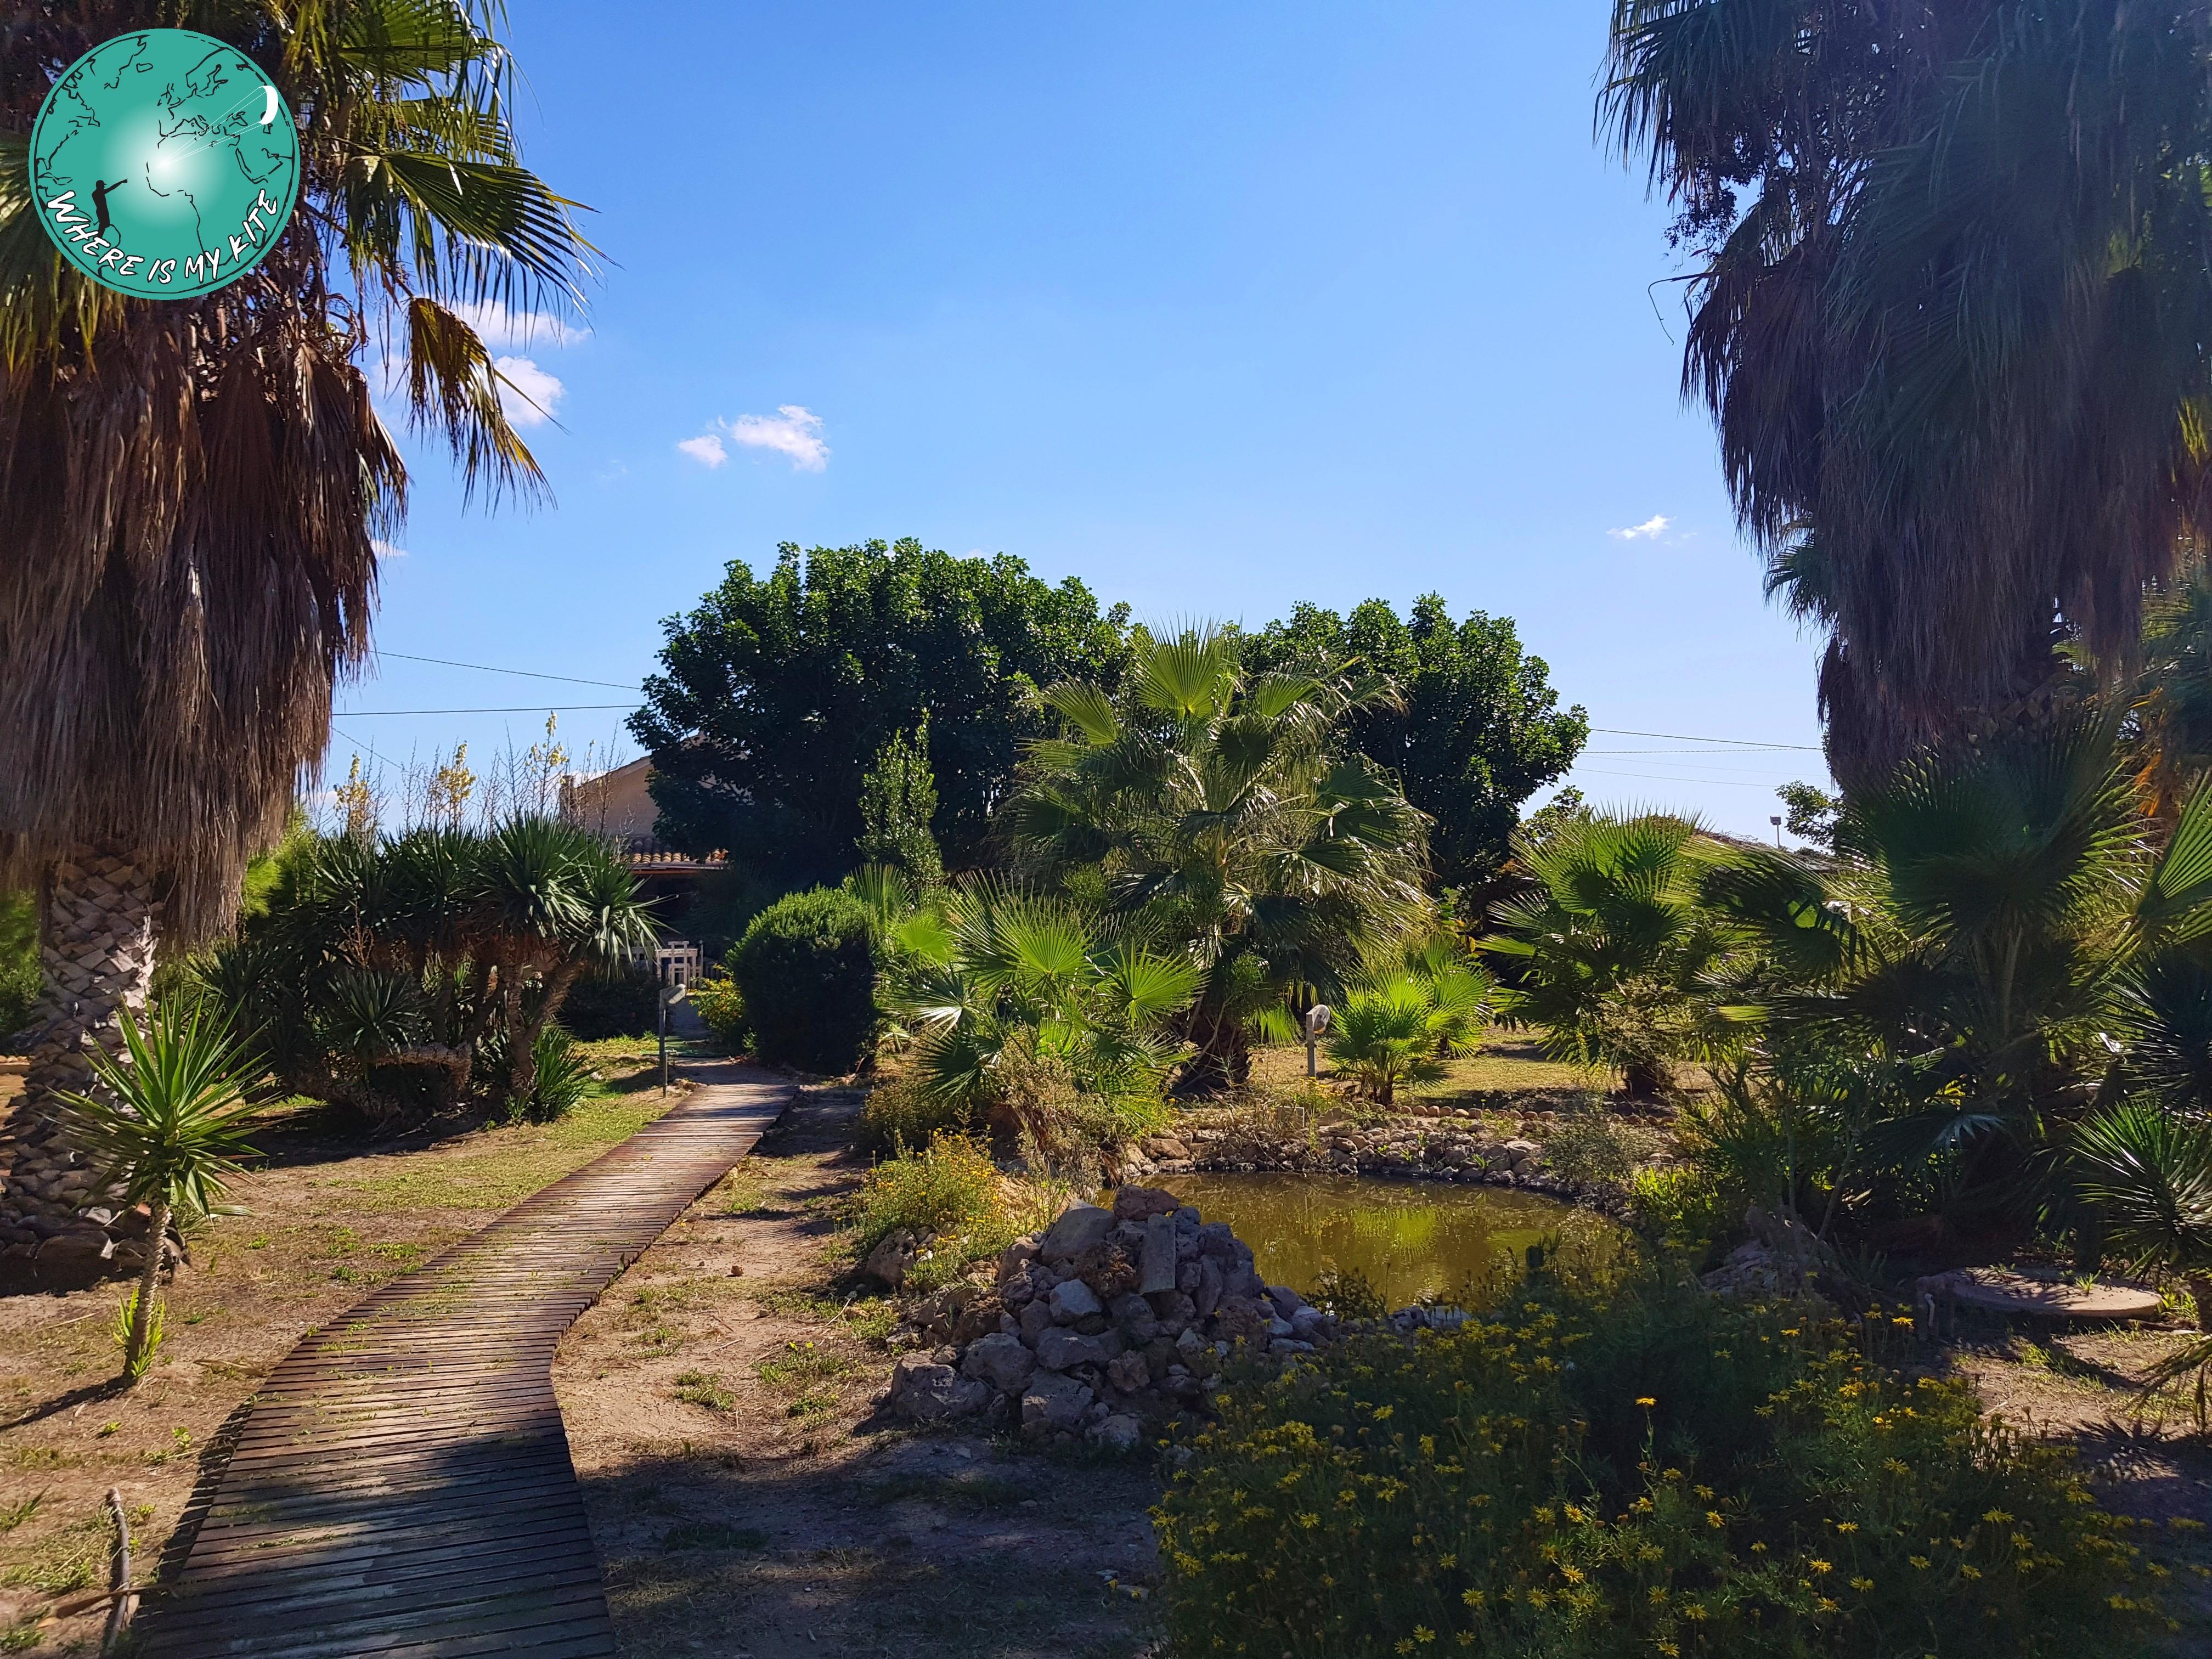 Le jardin d'Eden de Marsala